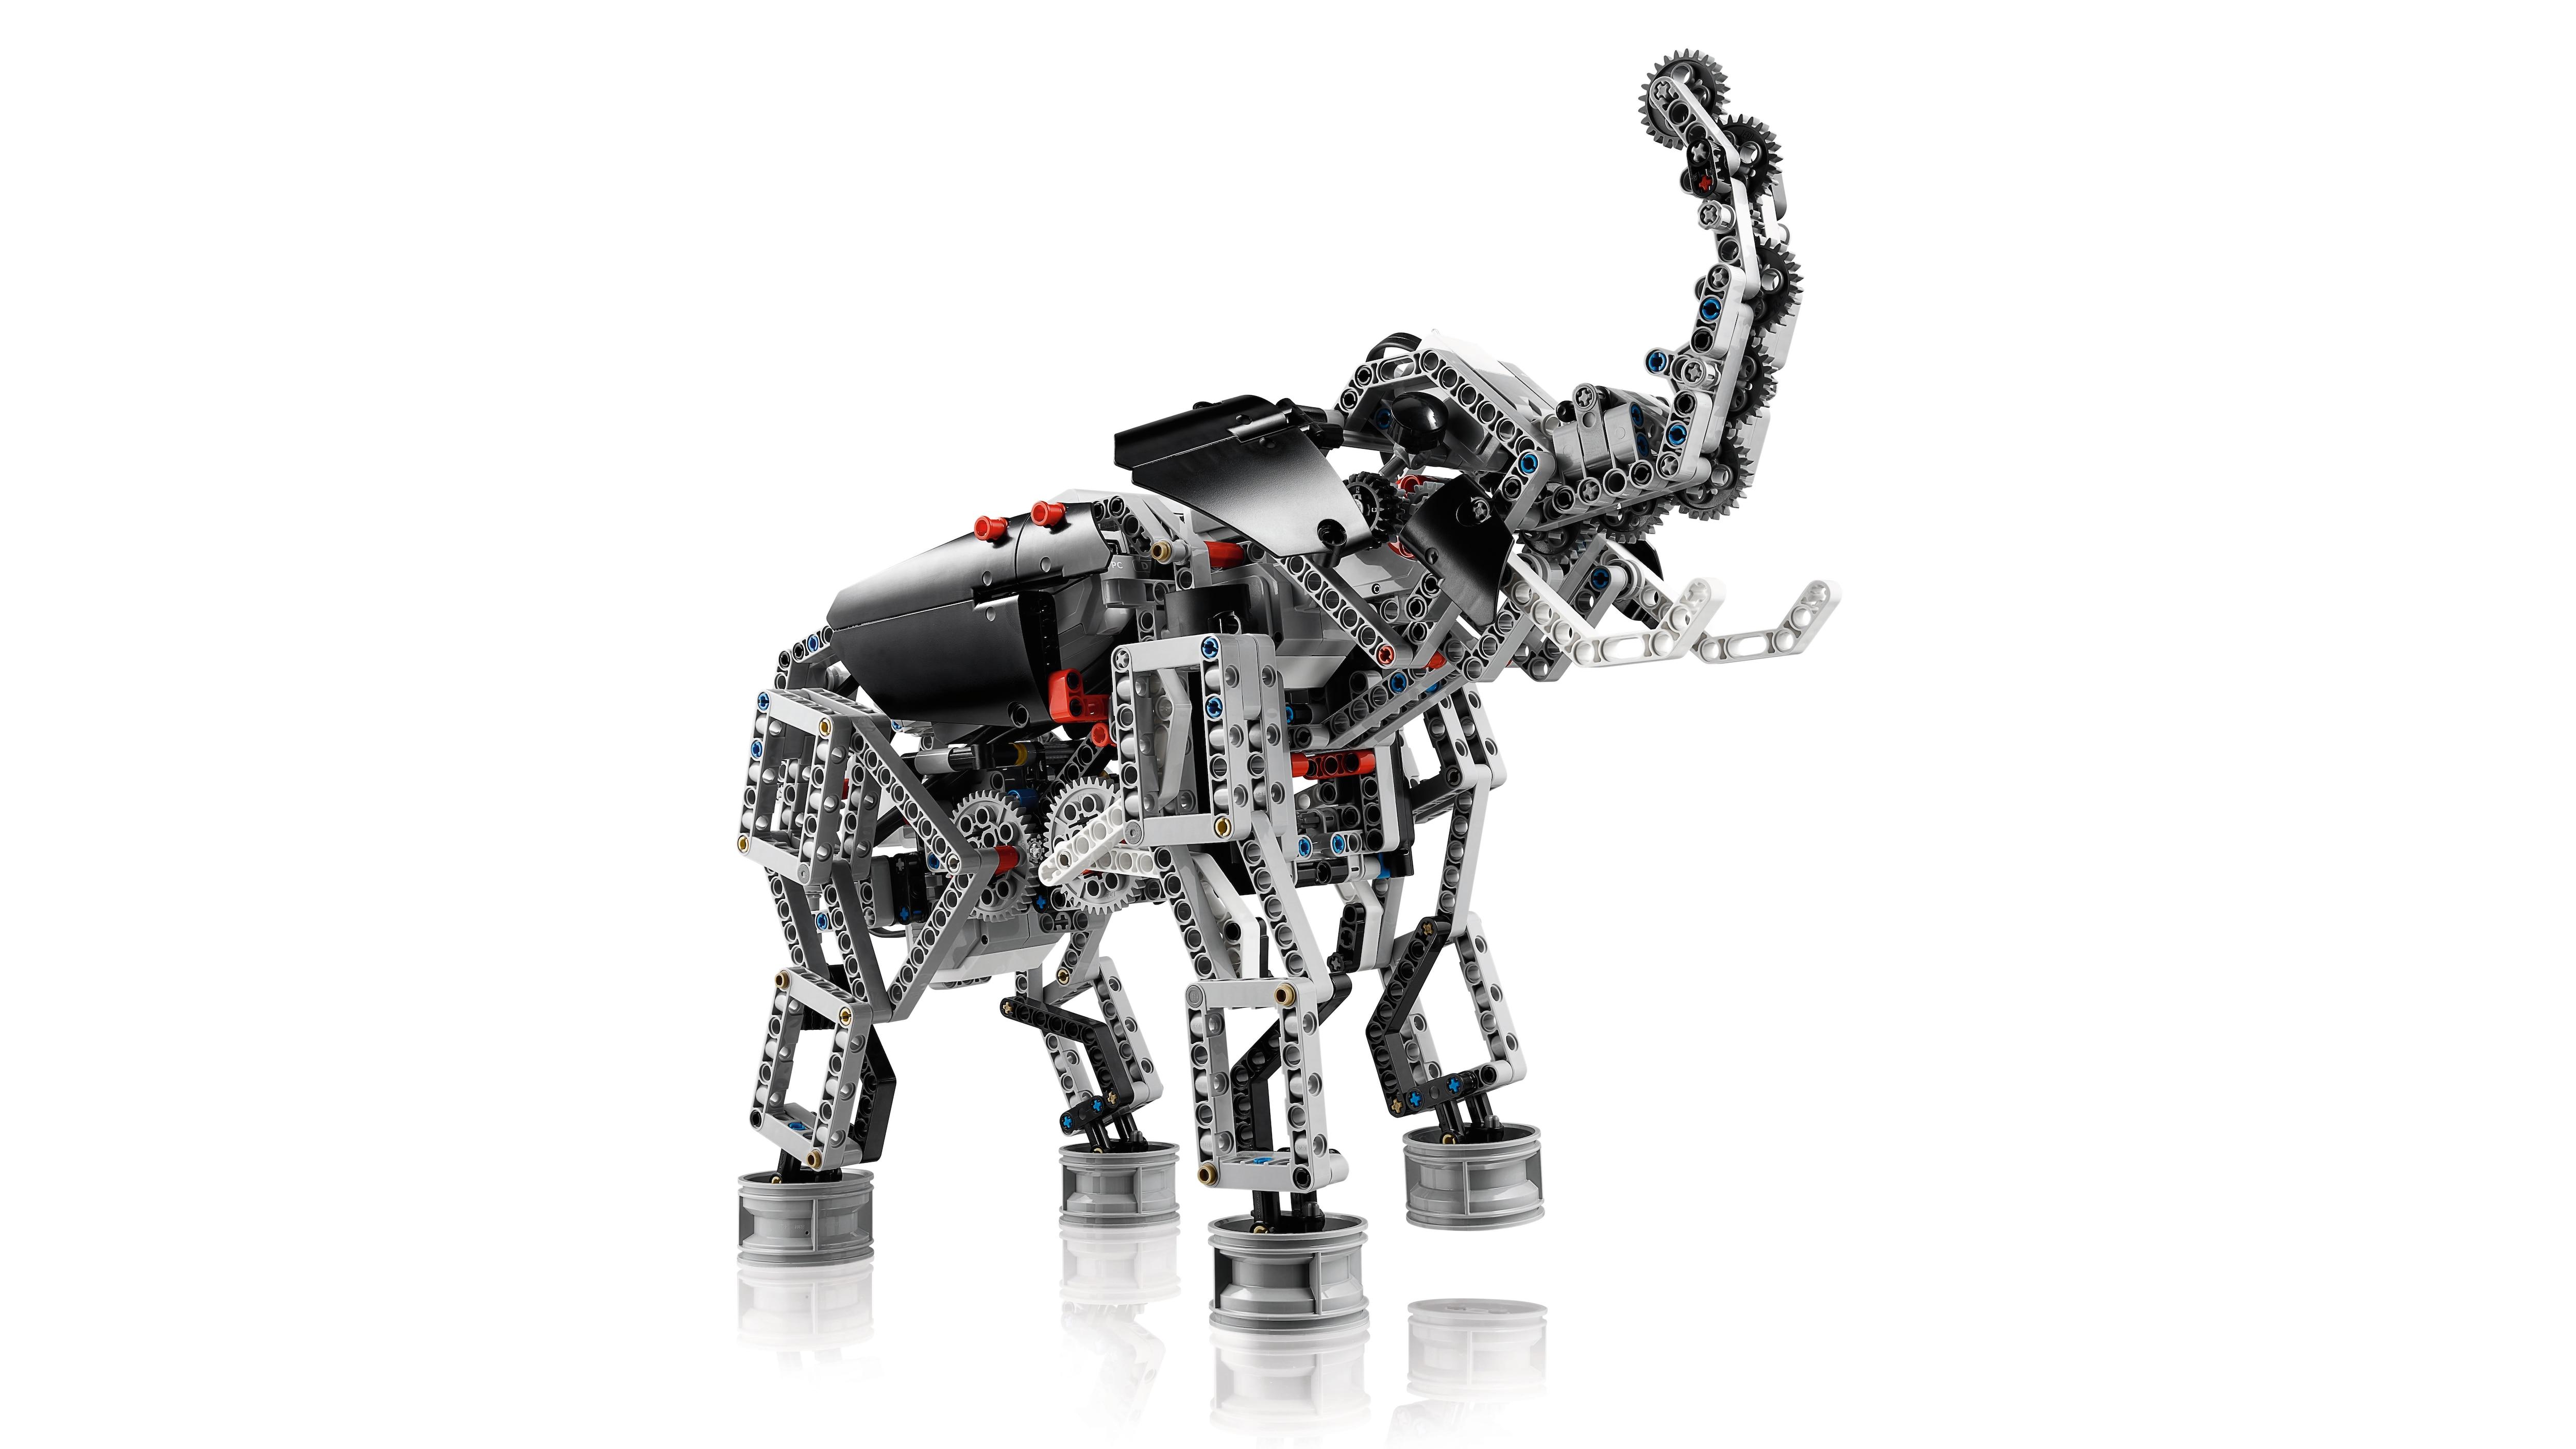 EV3 Elephant model